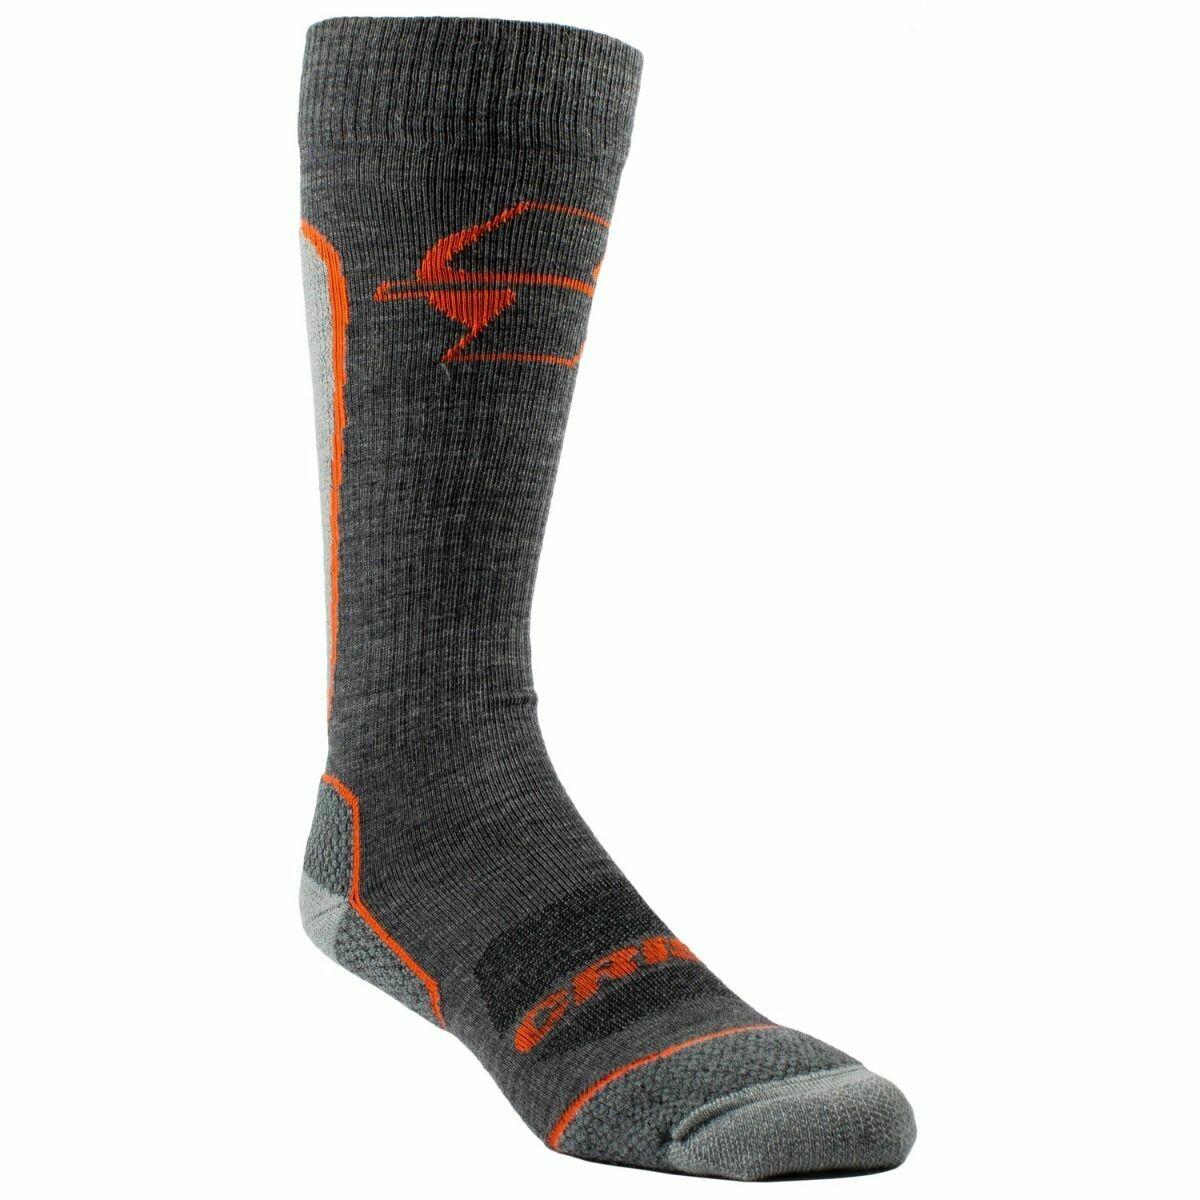 Crispi Manti Lightweight Mid-Calf Socks